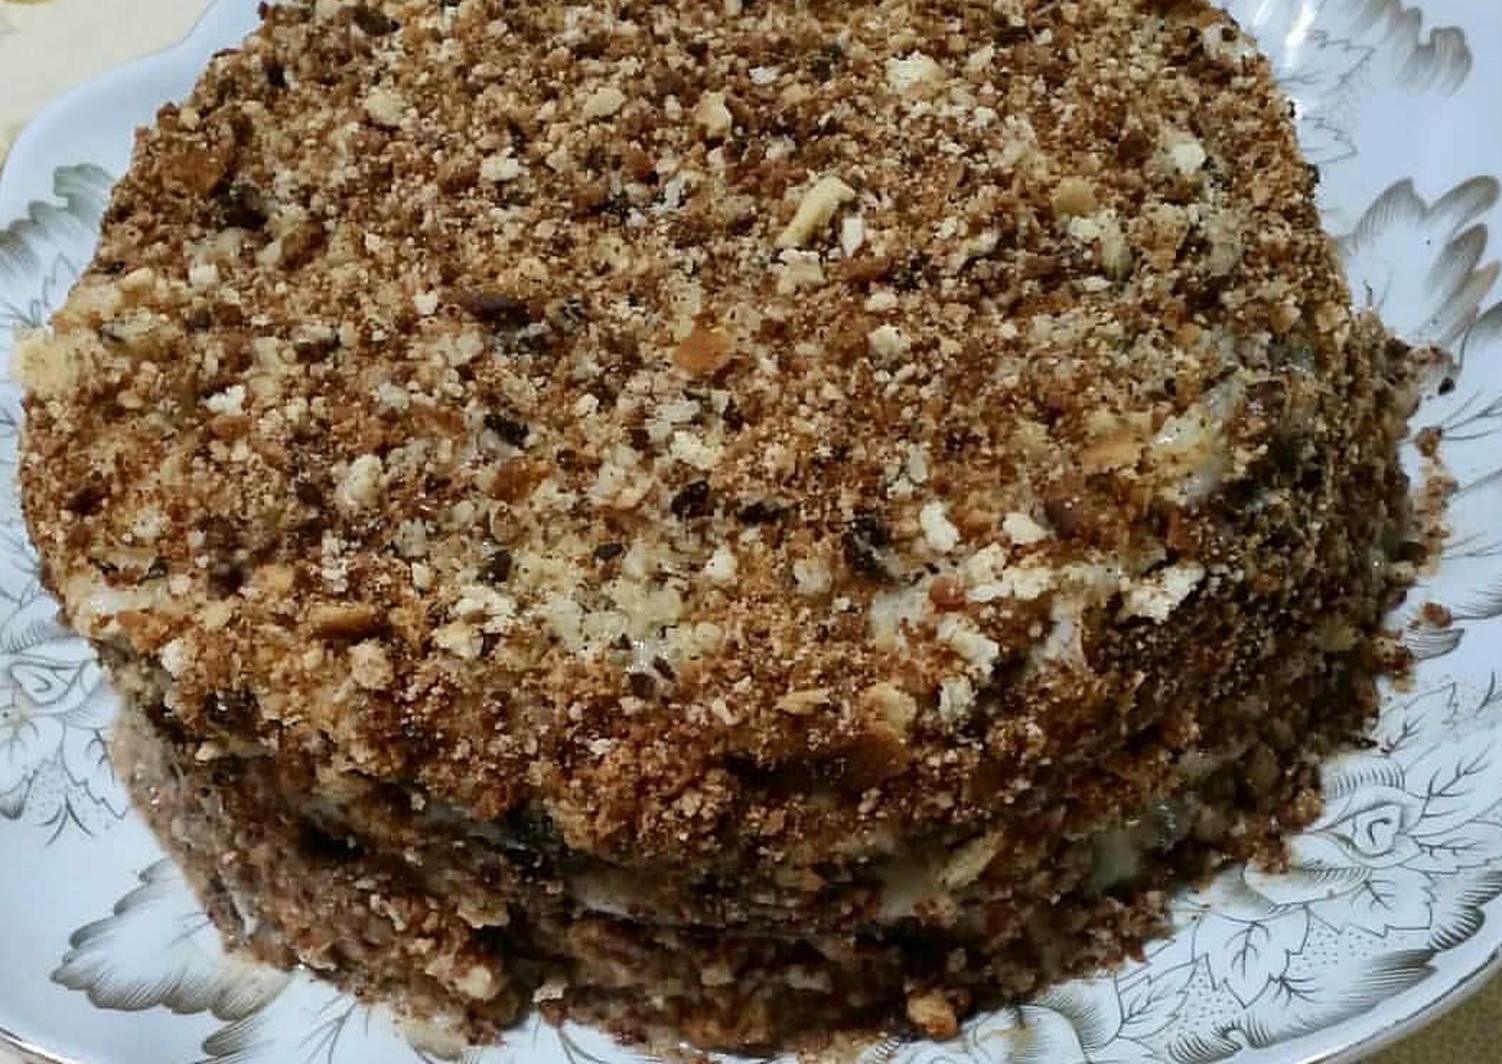 торт медовик ангарский рецепт с фото корпуса